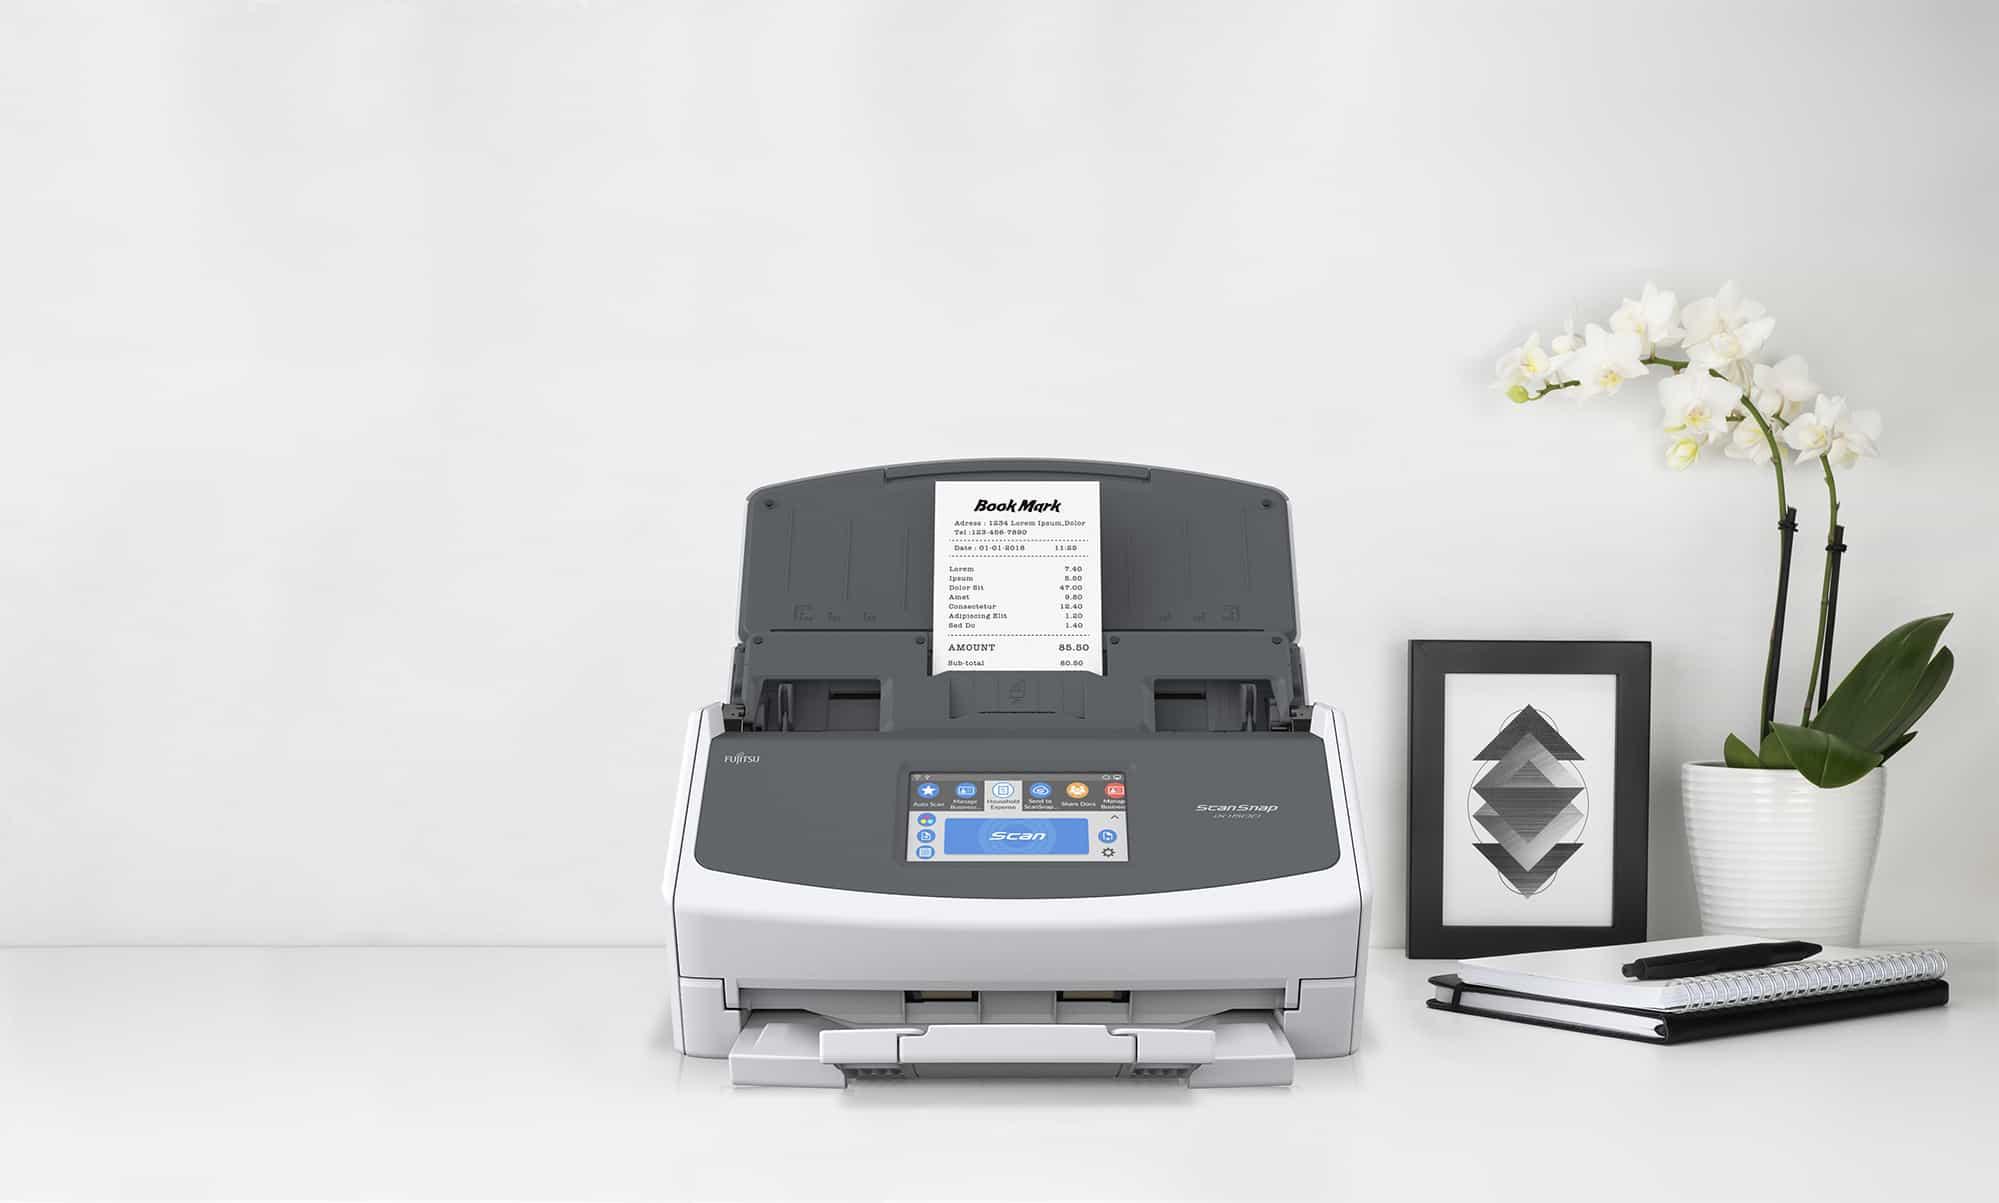 Máy scan mạng wifi Fujitsu Scansnap ix1500